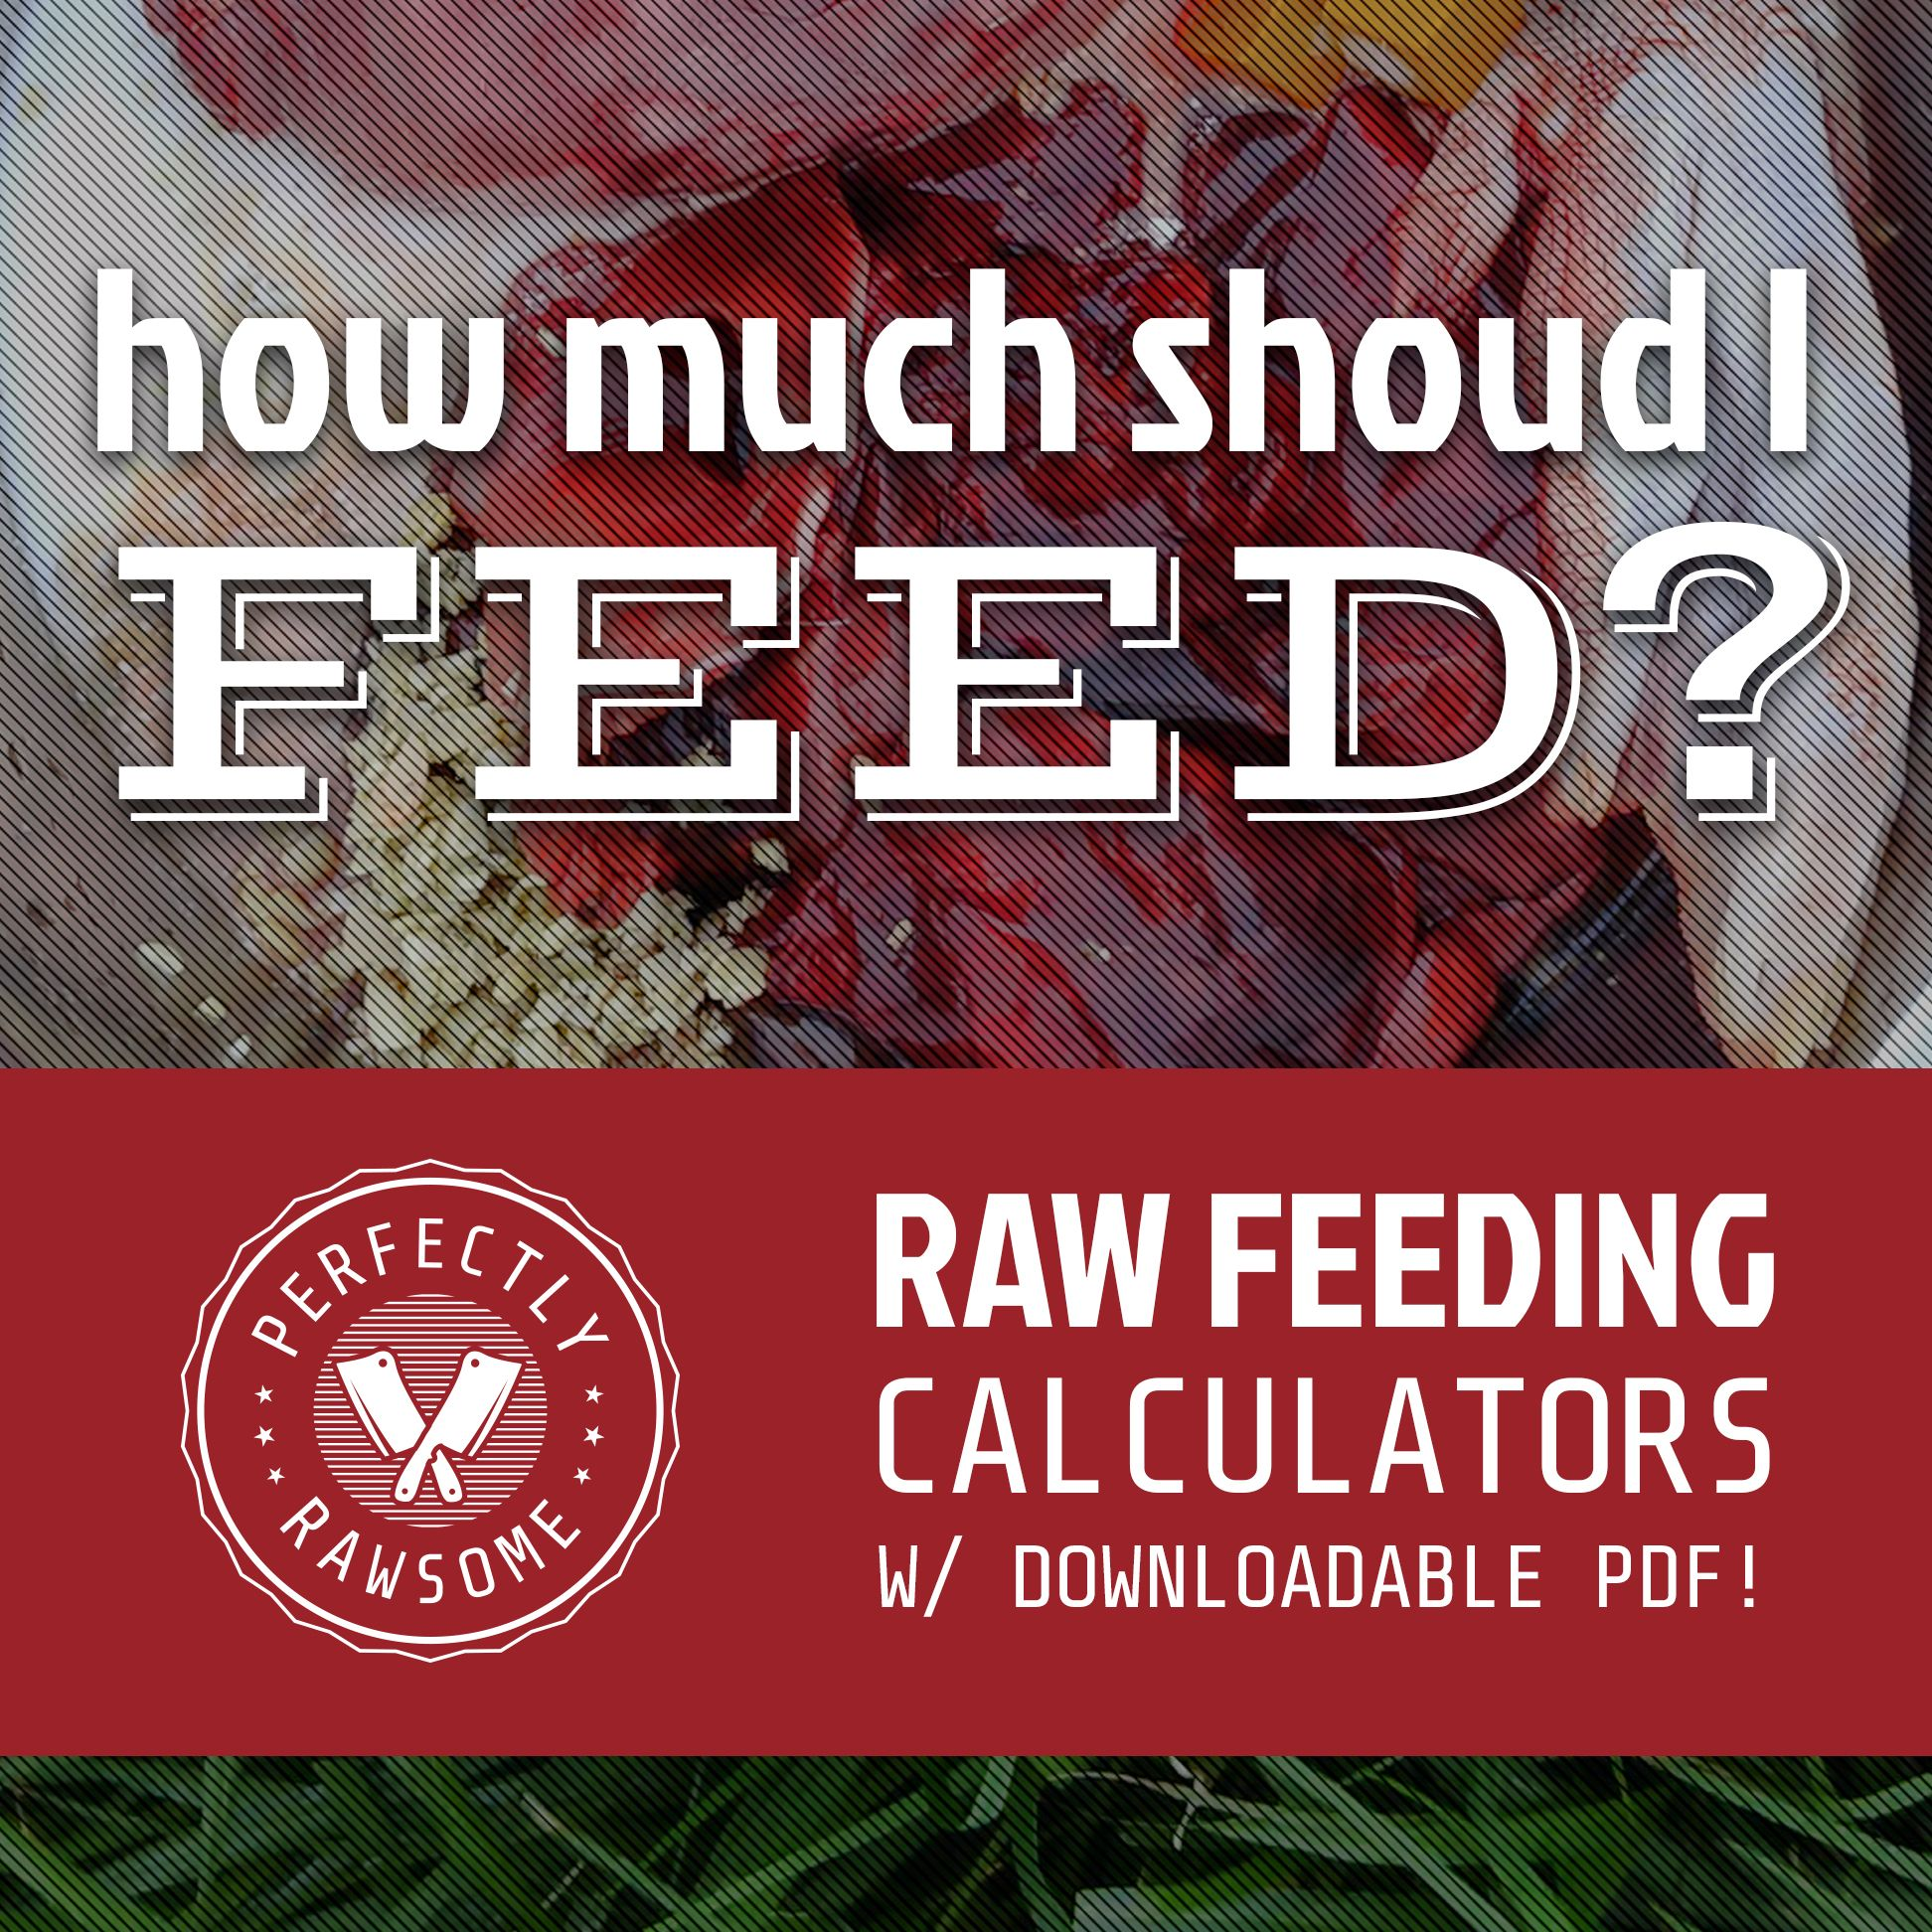 Raw Feeding Calculators For Cats Dogs Raw Dog Food Diet Raw Cat Food Recipes Raw Dog Food Recipes